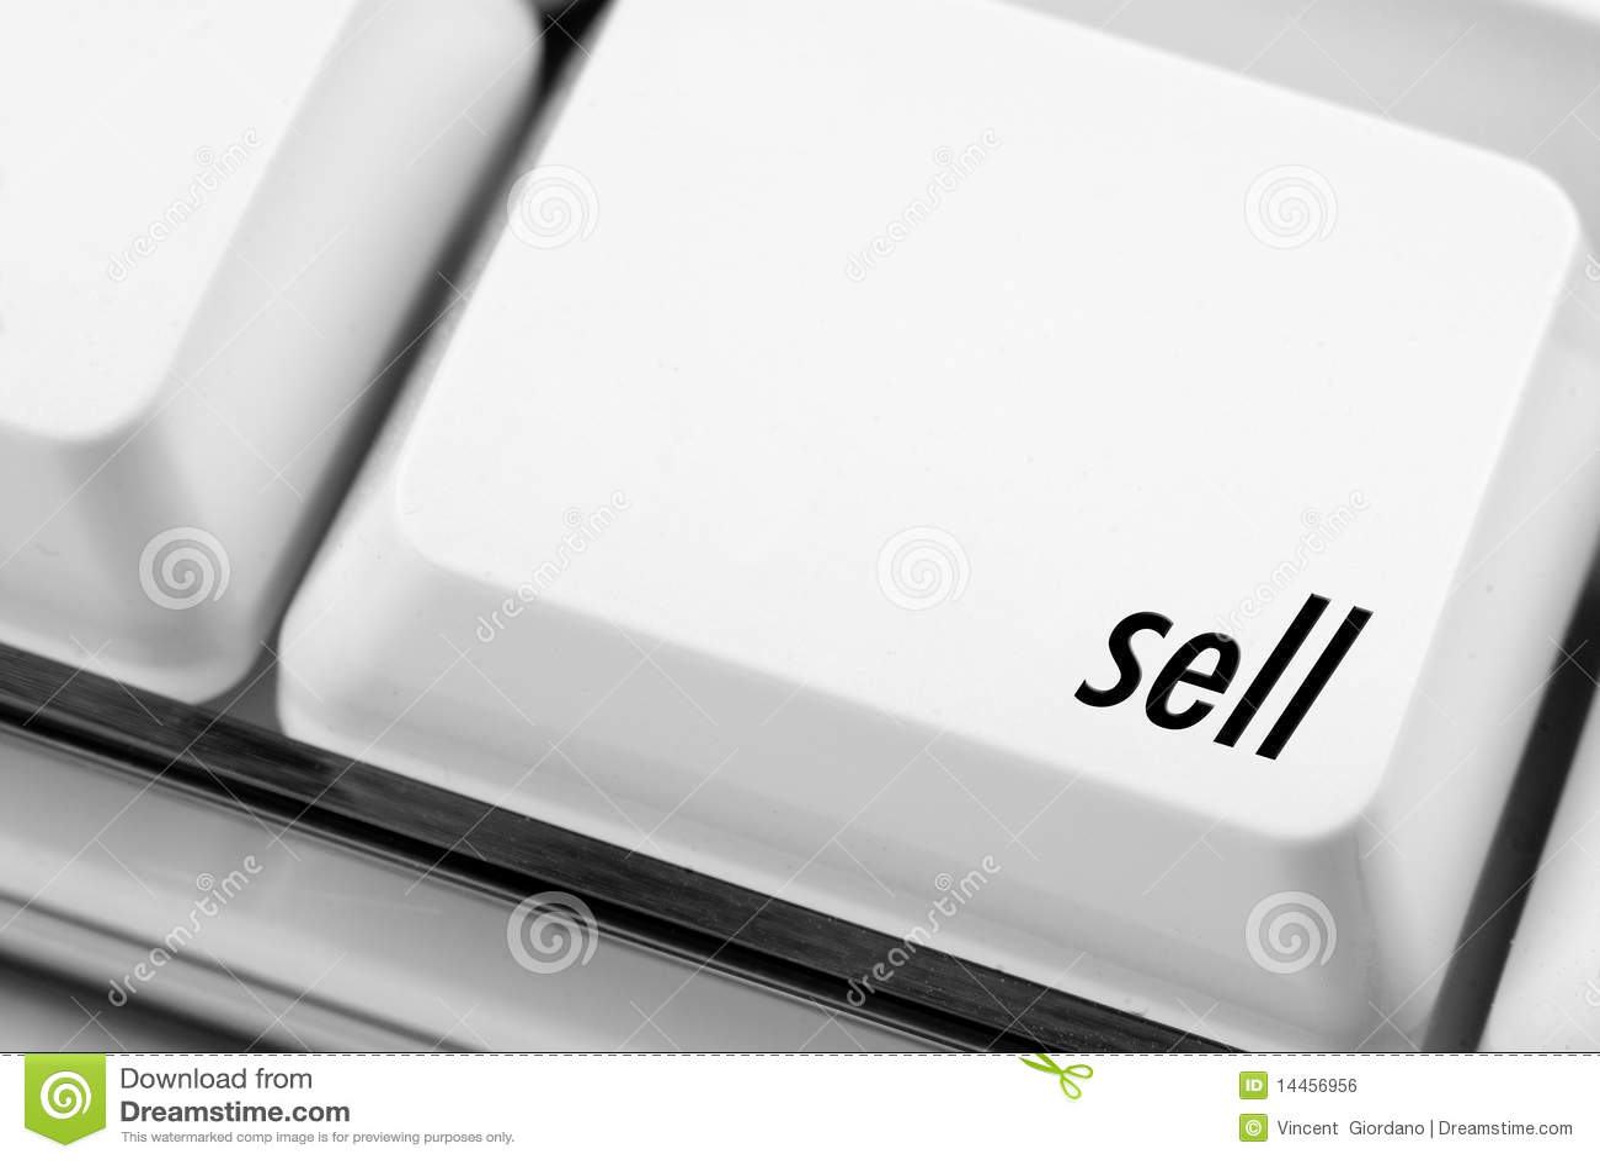 Key sell